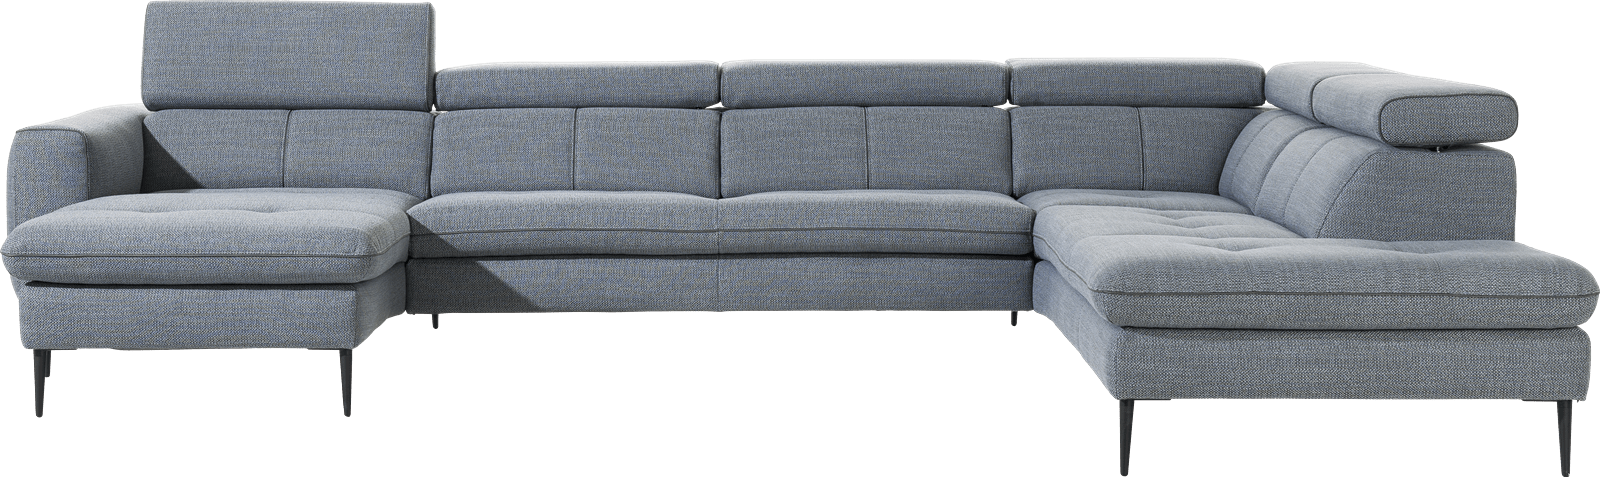 XOOON - Talisman - Sofas - Longchair links - 2,5 Sitzer ohne Armlehne - Ottomane rechts